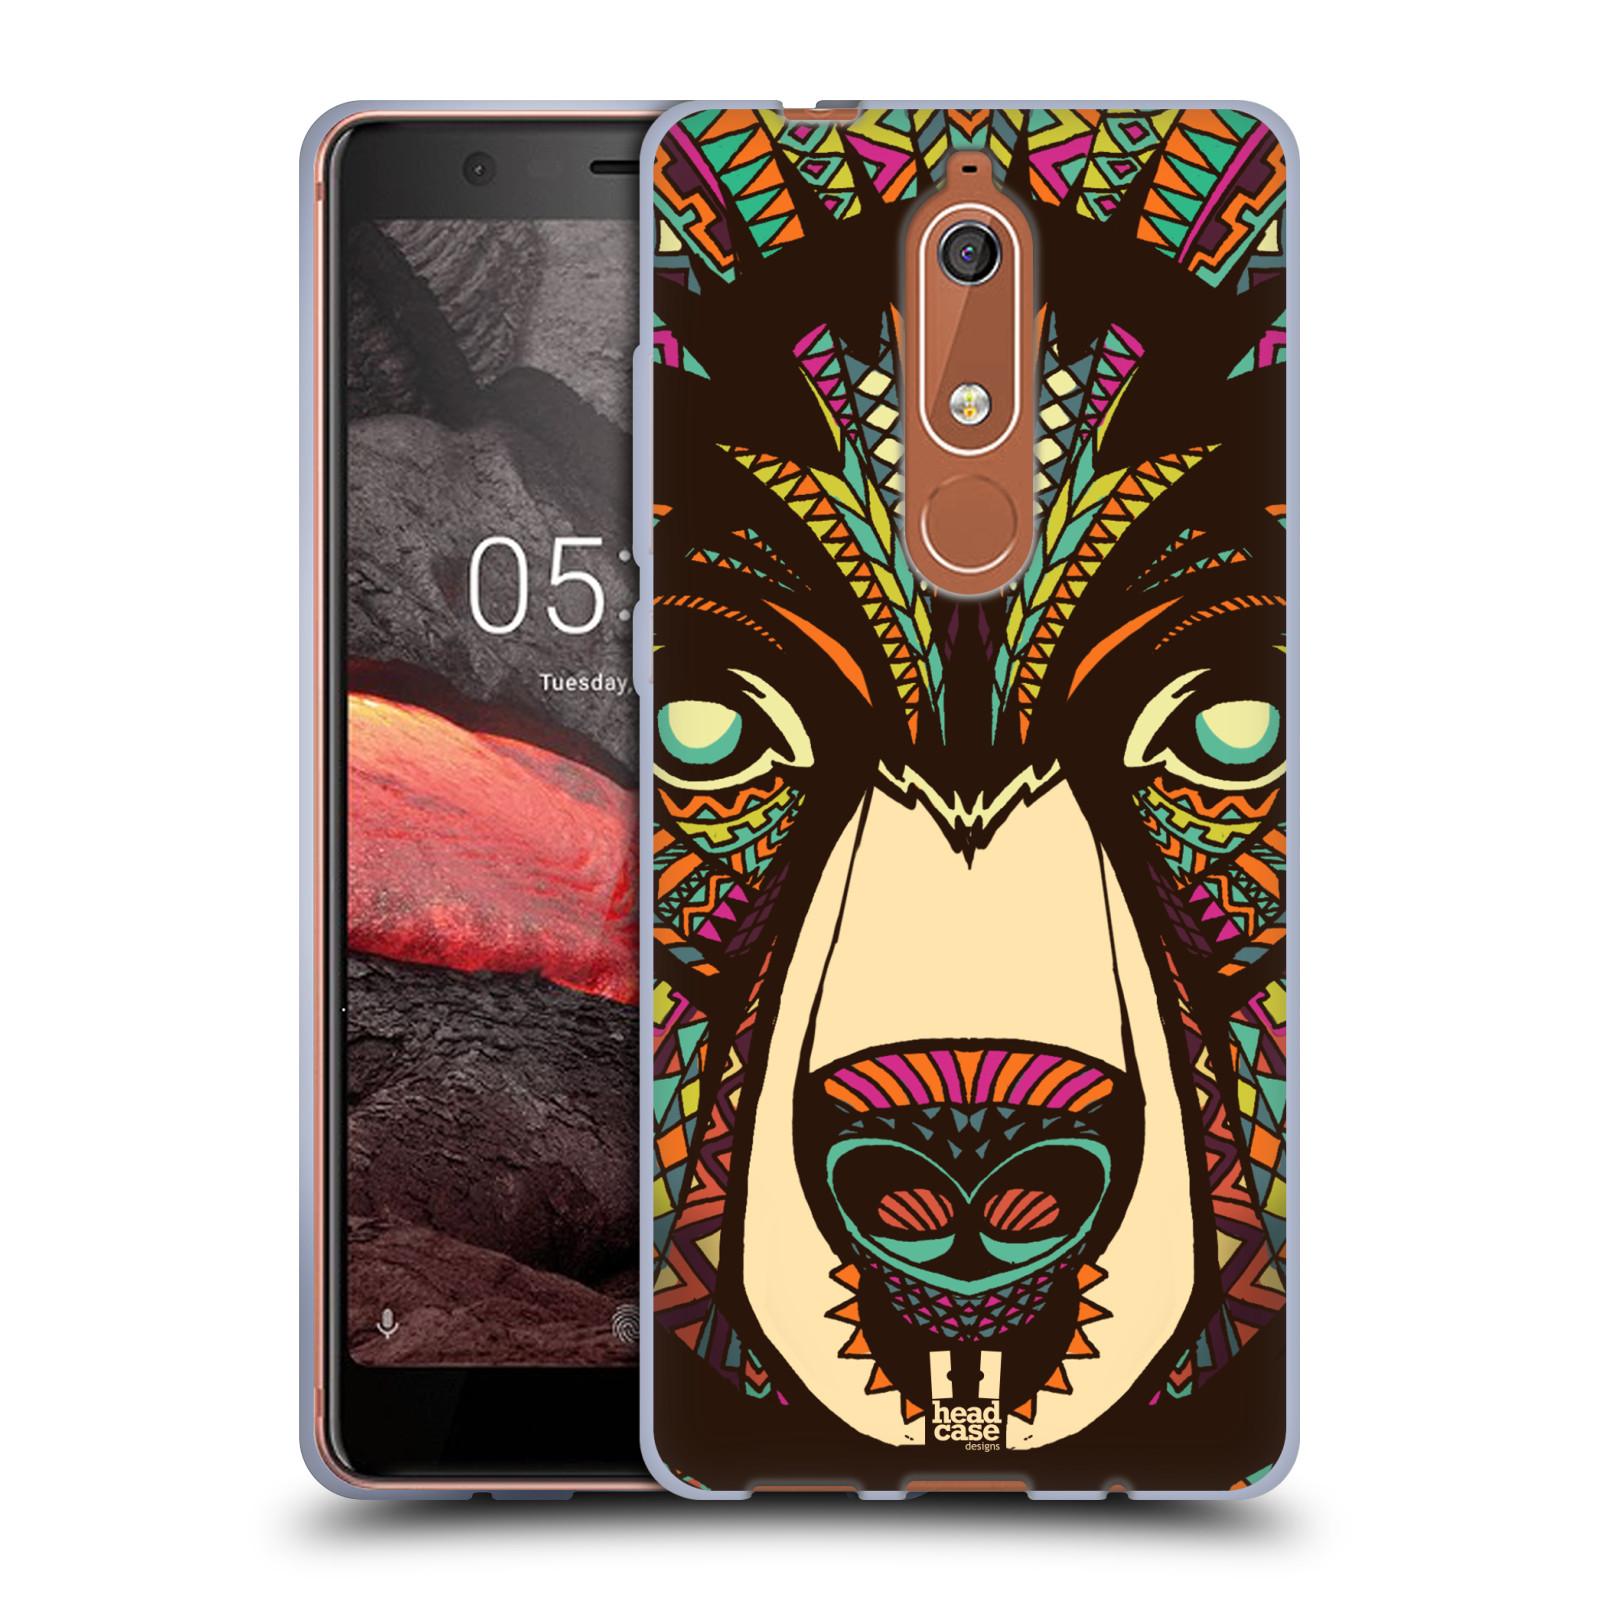 Silikonové pouzdro na mobil Nokia 5.1 - Head Case - AZTEC MEDVĚD